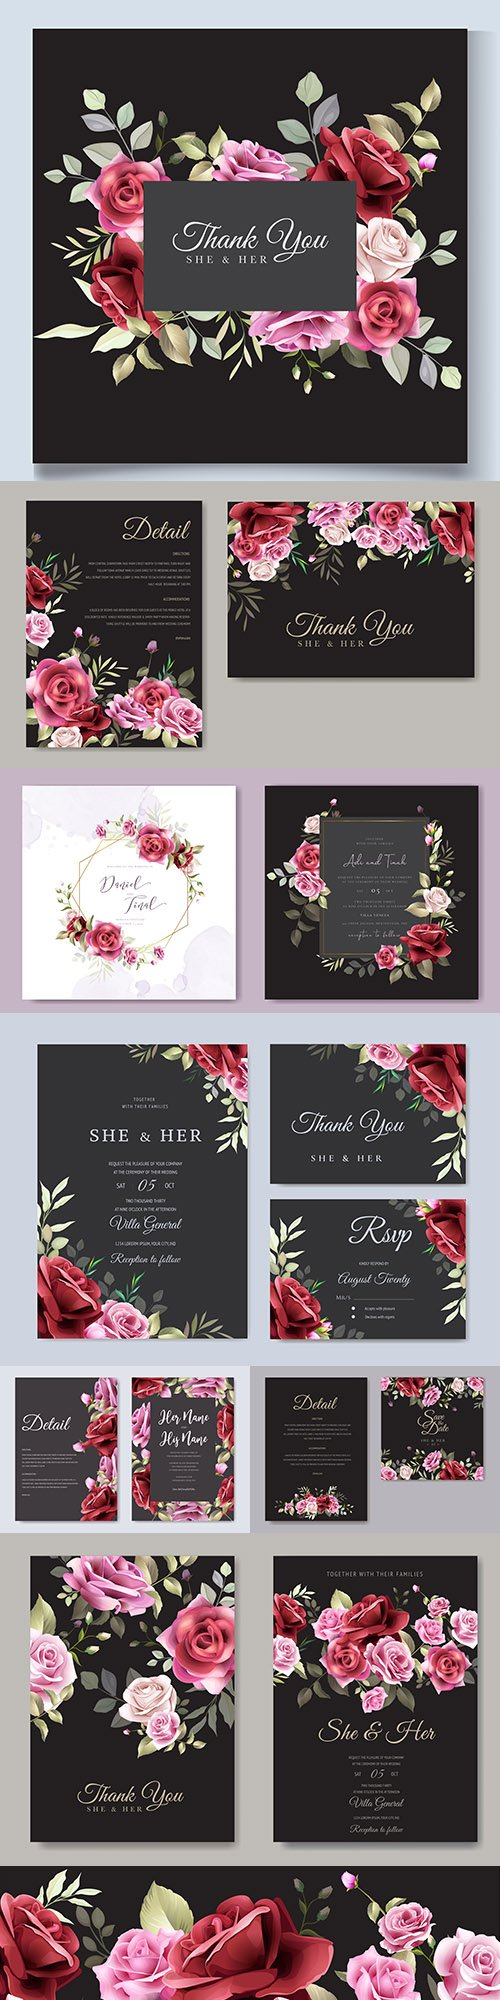 Wedding invitations floral elegant decorative template 7